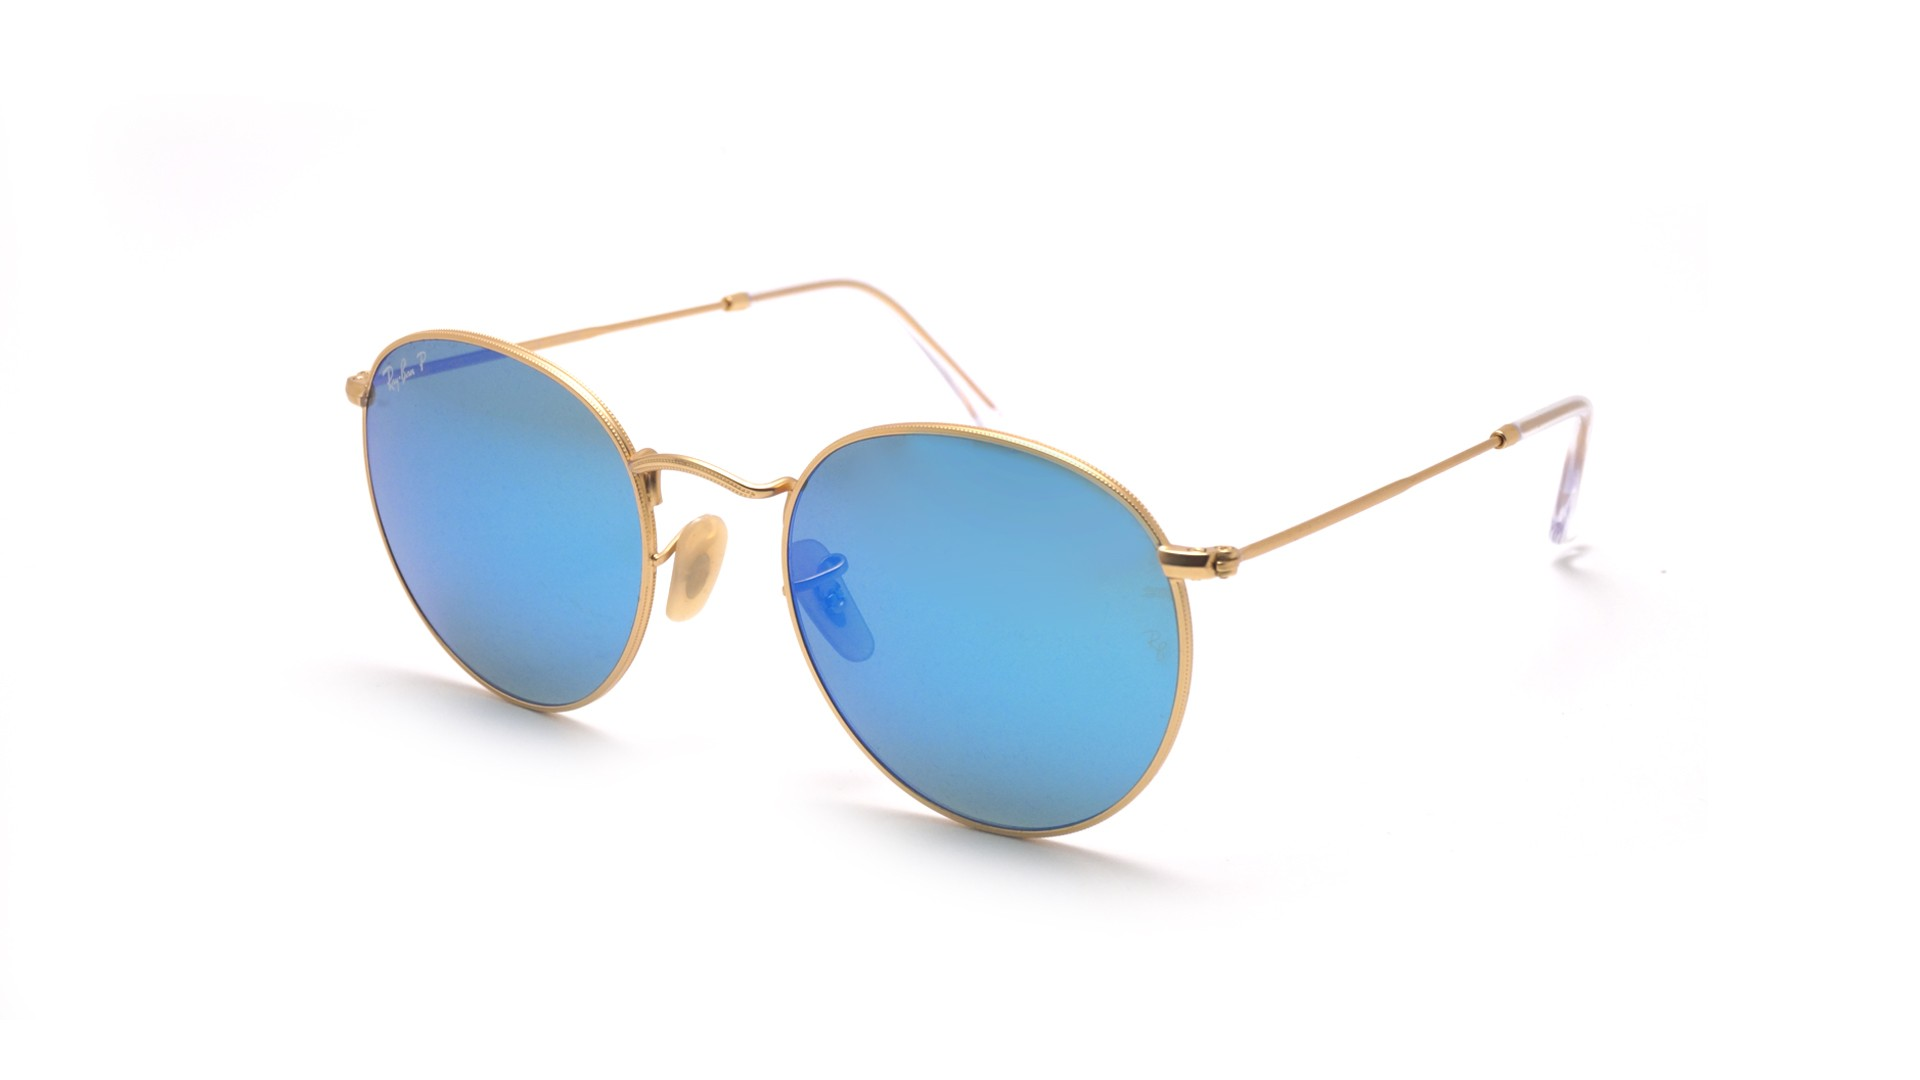 ray ban round metal sunglasses blue